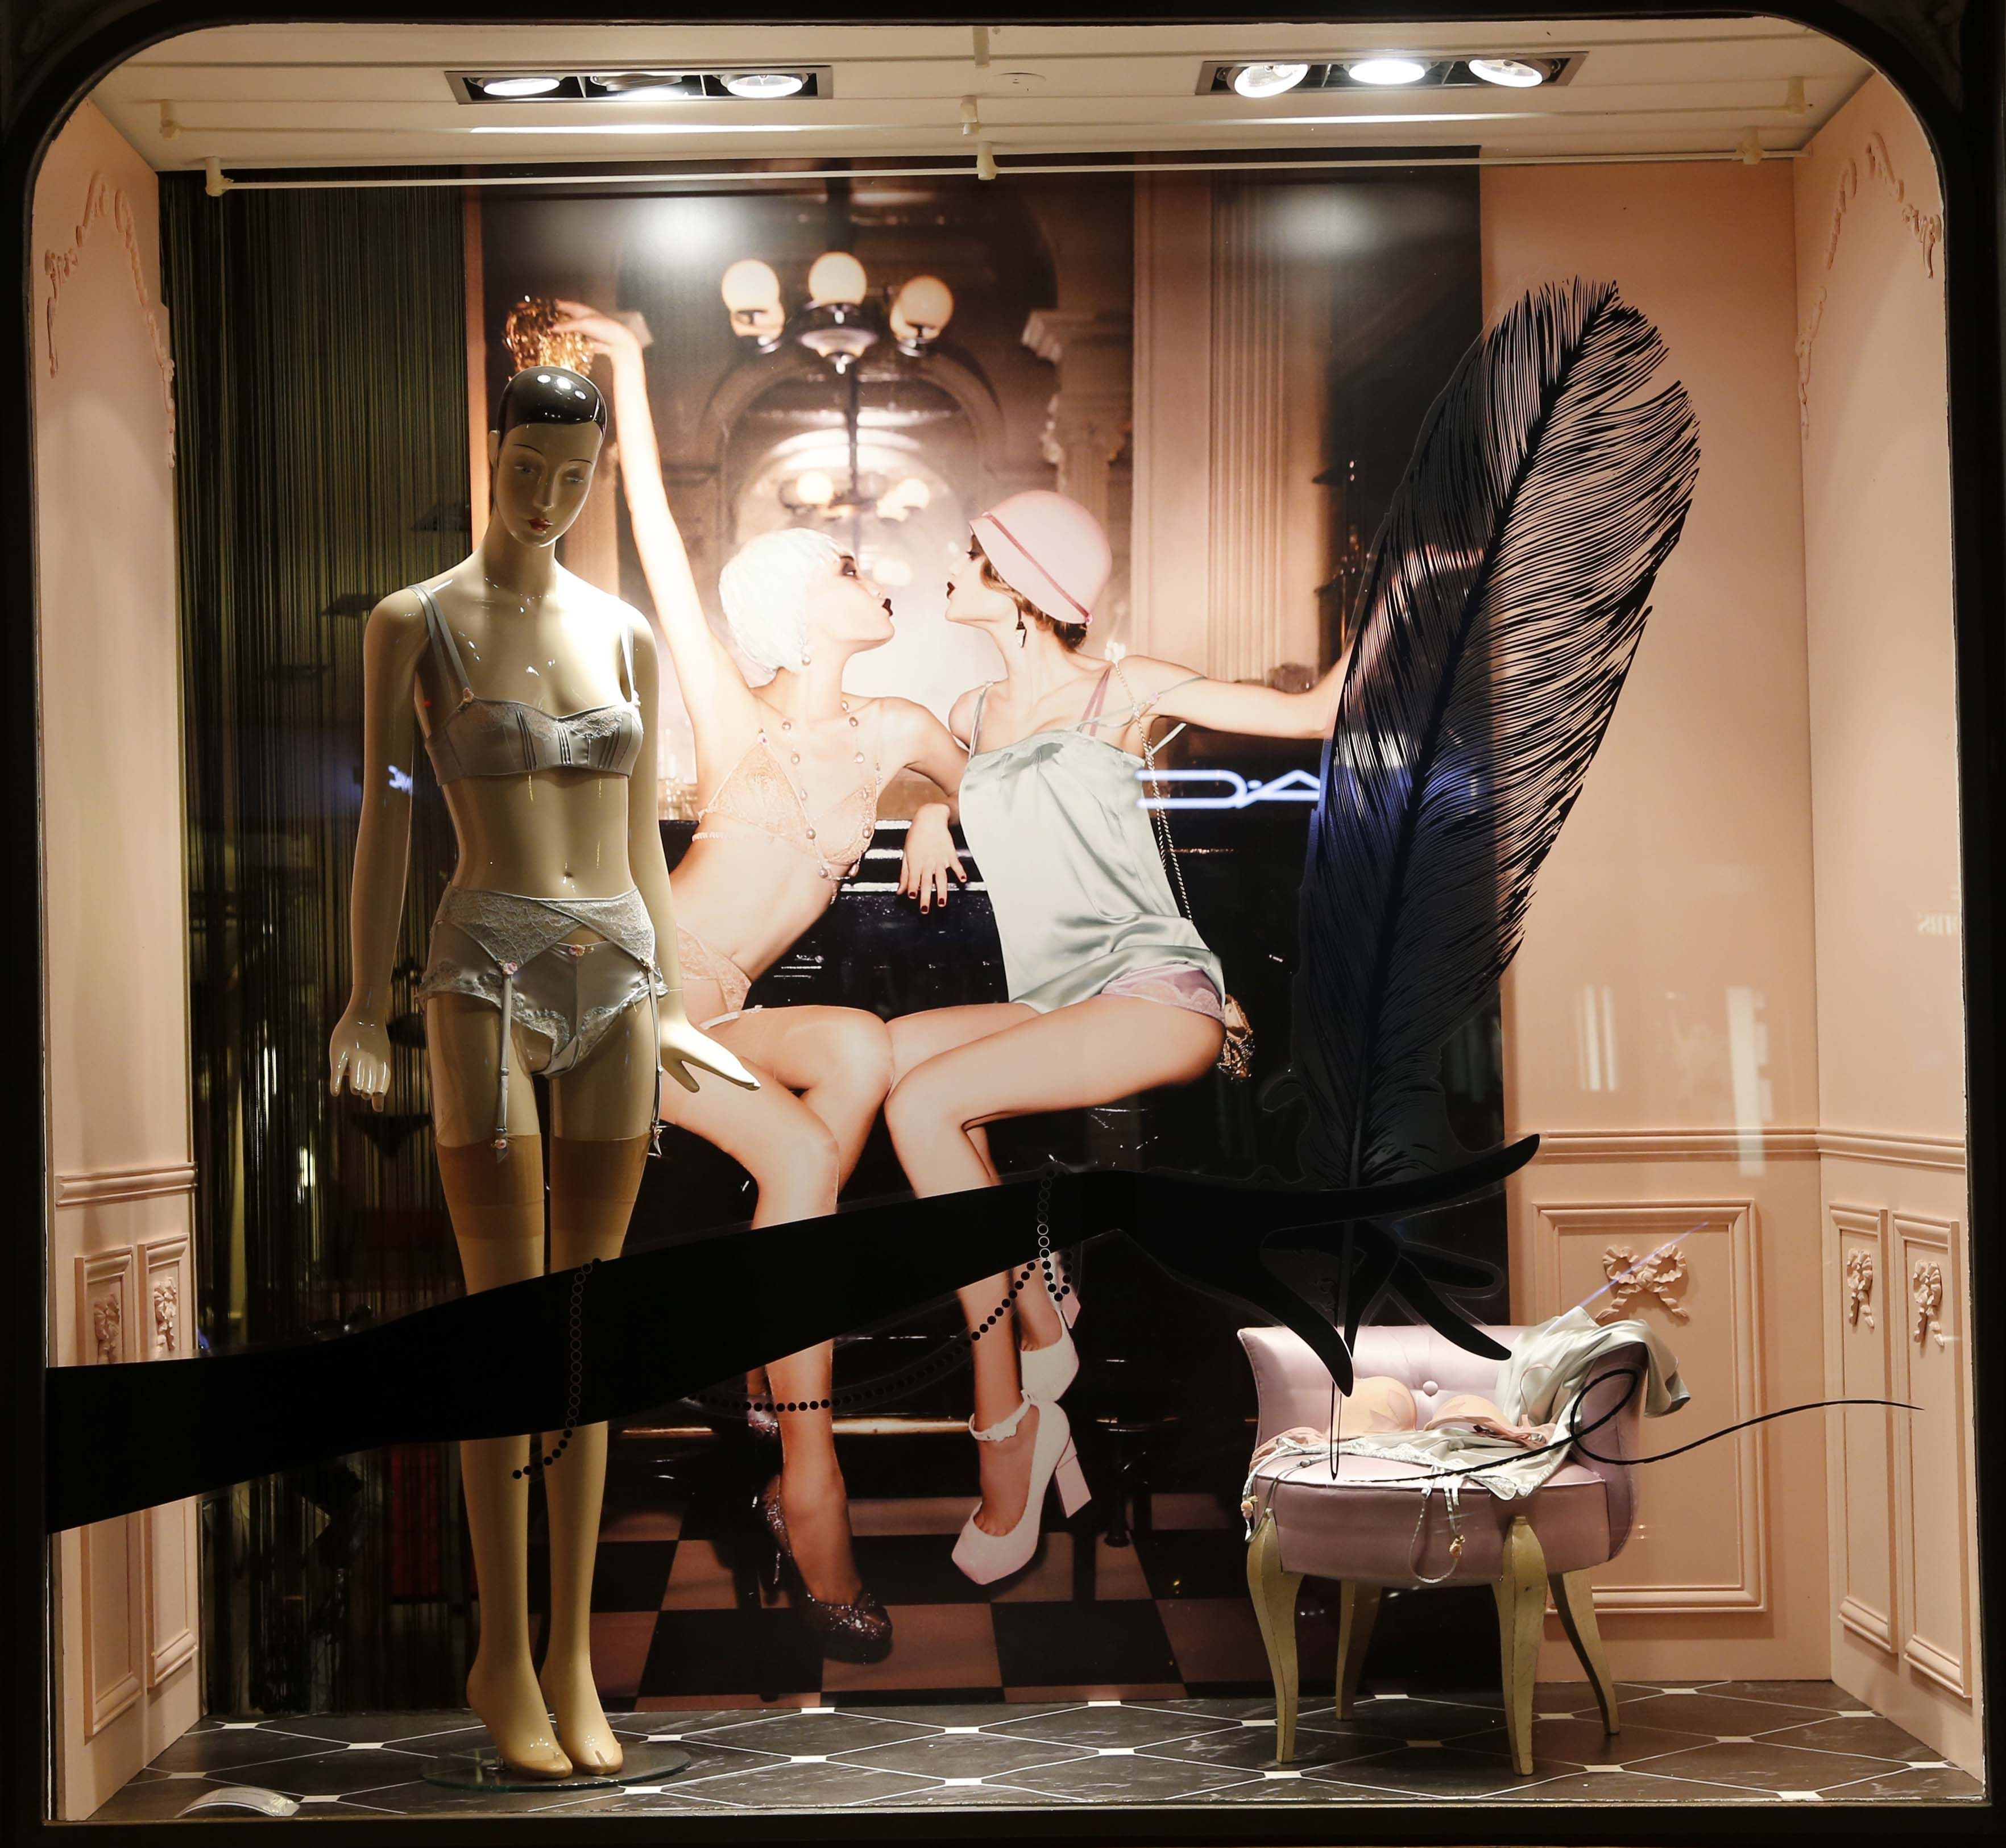 Juillet 2014 vitrine boutique chantal thomass 211 rue saint honor paris cha - Hotel chantal thomass paris ...